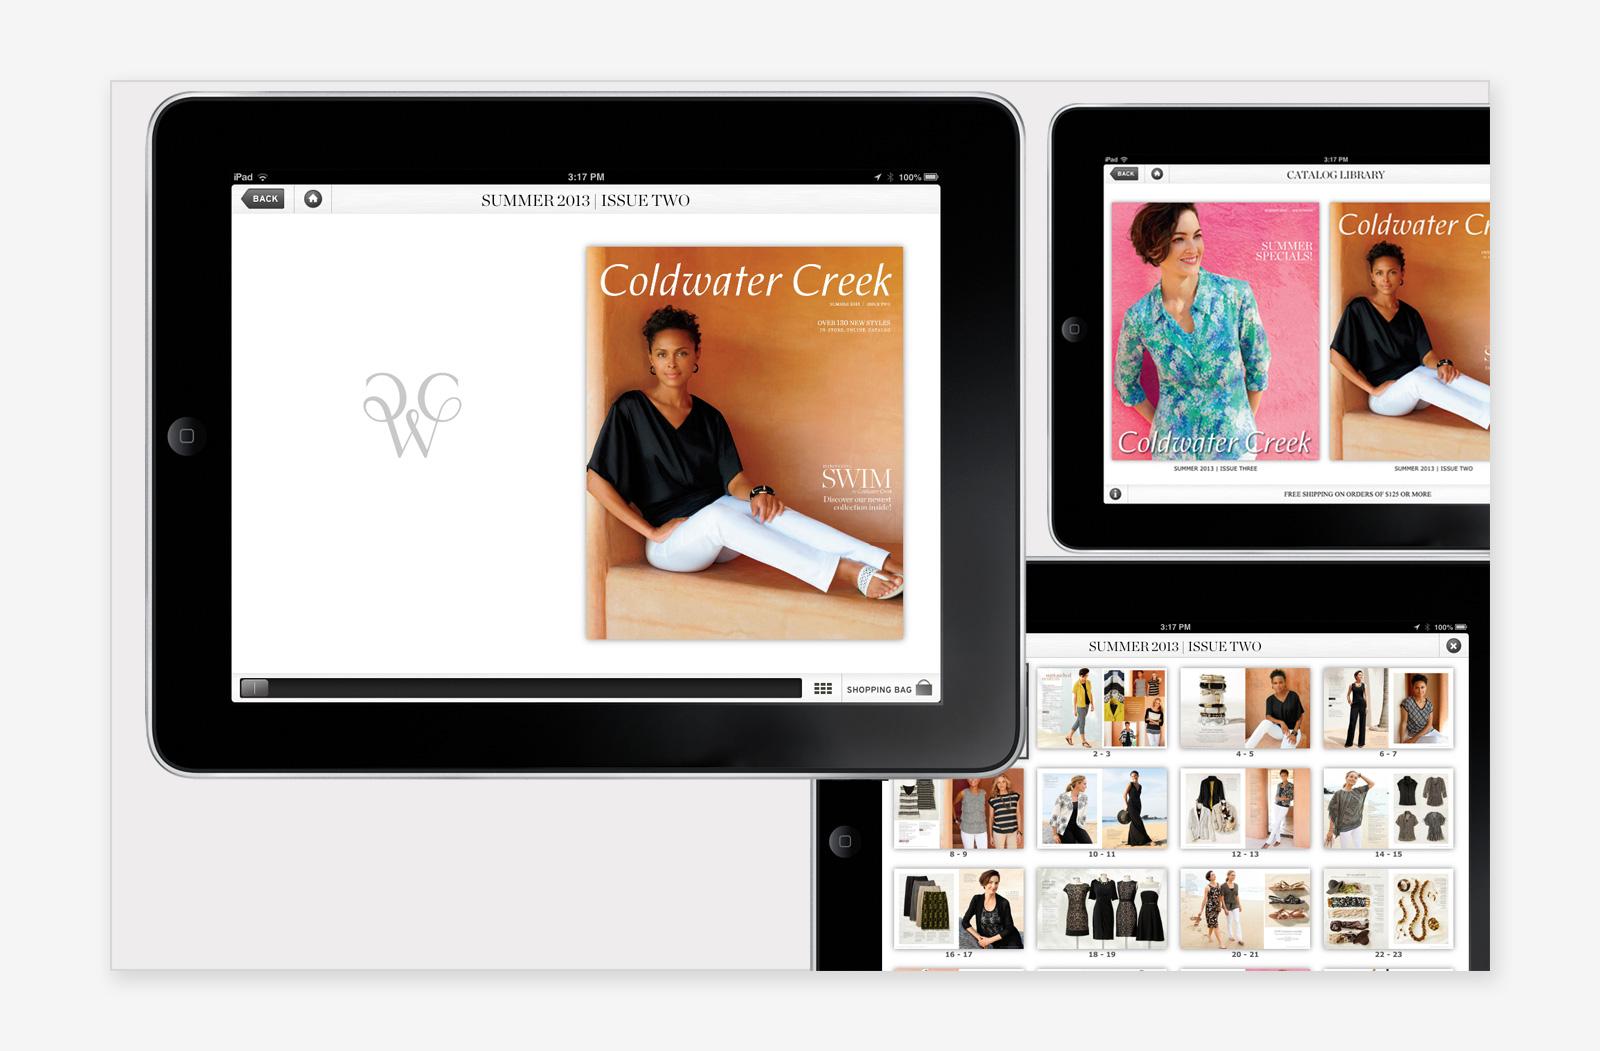 cwc-iPad-catalog.jpg